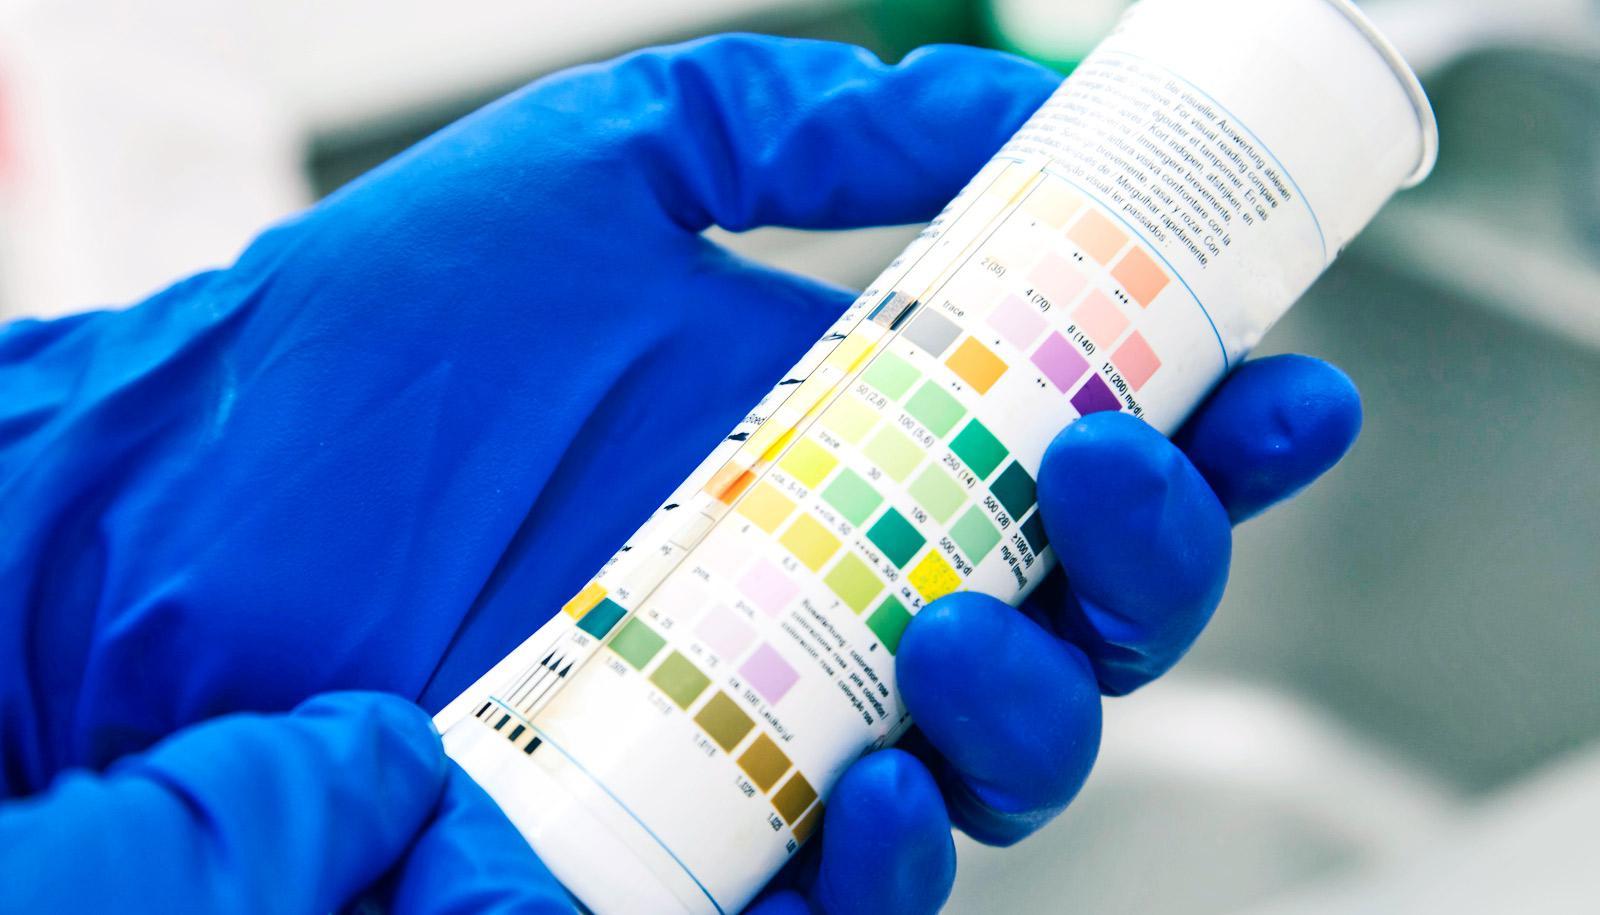 blue gloved hands hold urine test strips